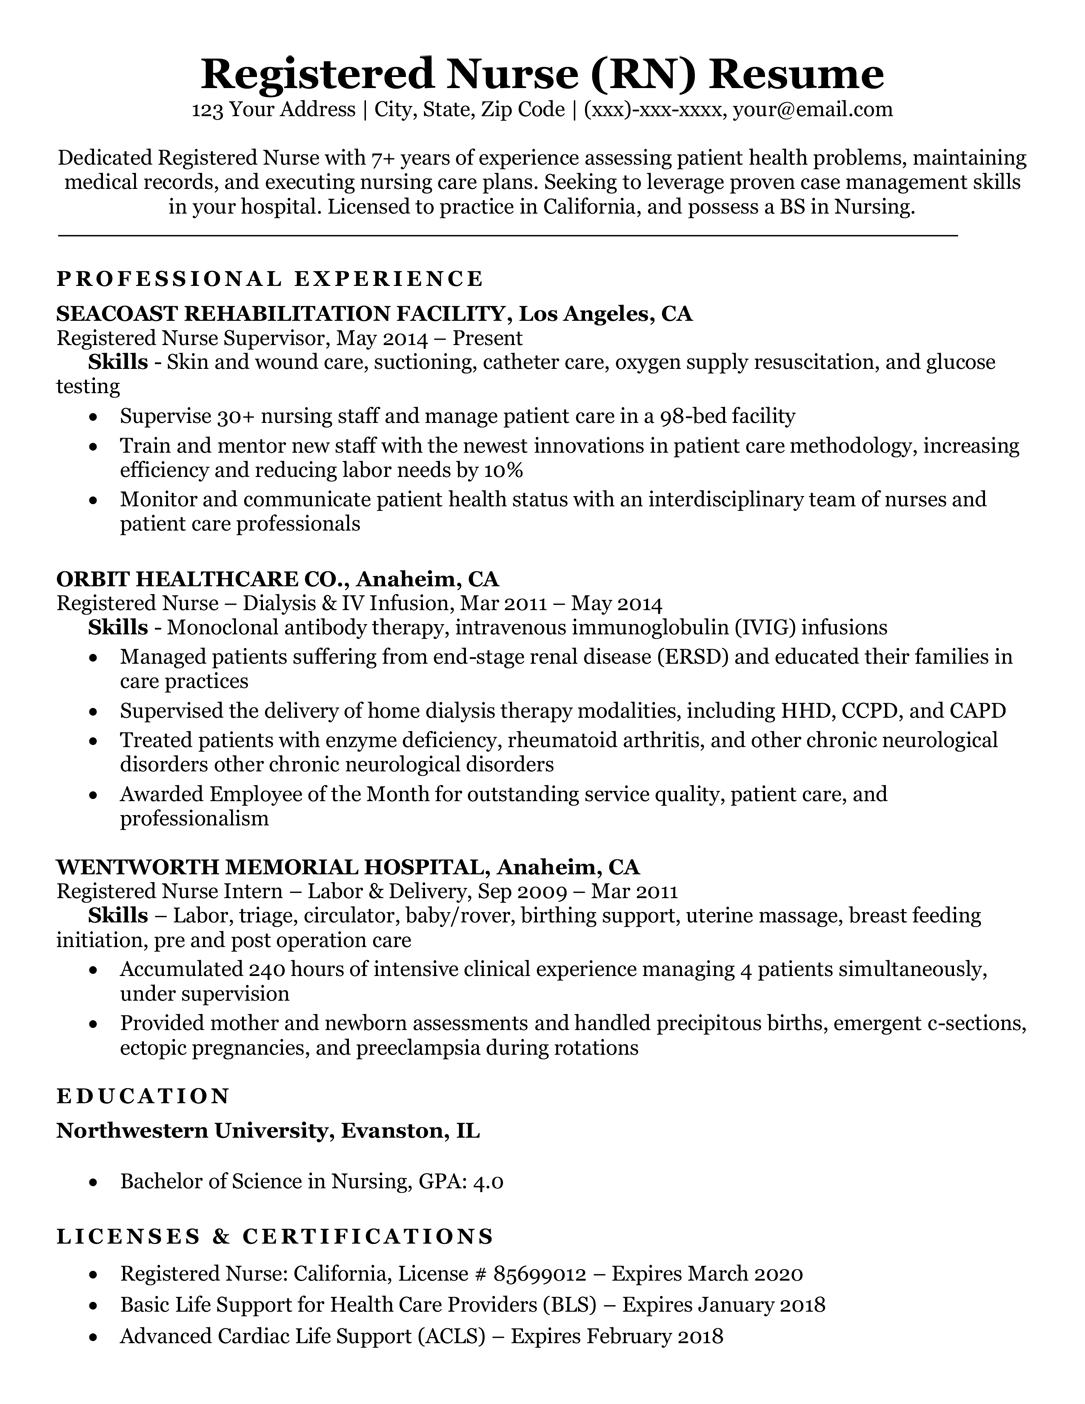 Registered Nurse Rn Resume Sample Amp Tips